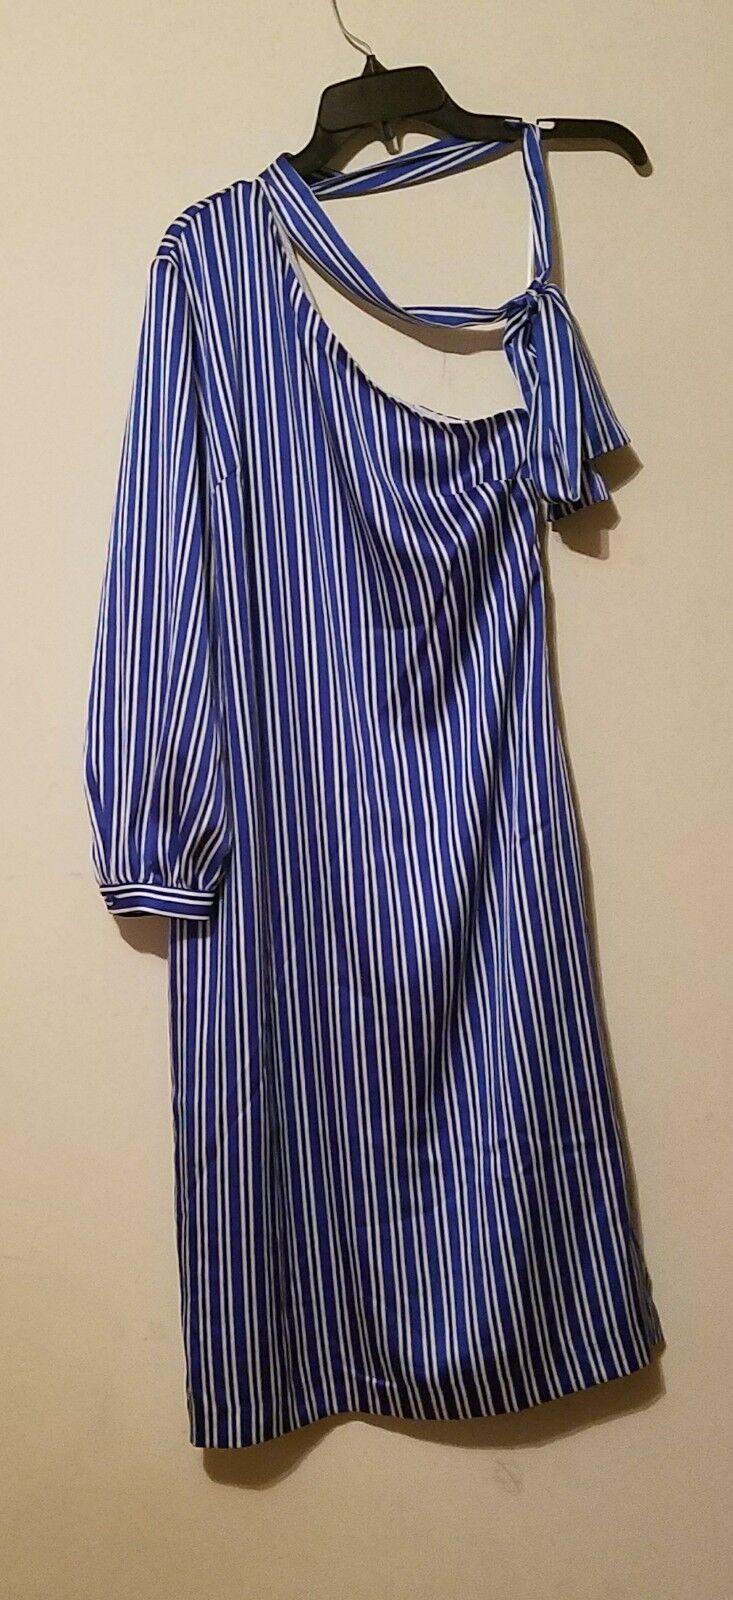 NWT Banana Republic One-Shoulder Stripe Bow Neck Cocktail Party Dress Blau Sz 0